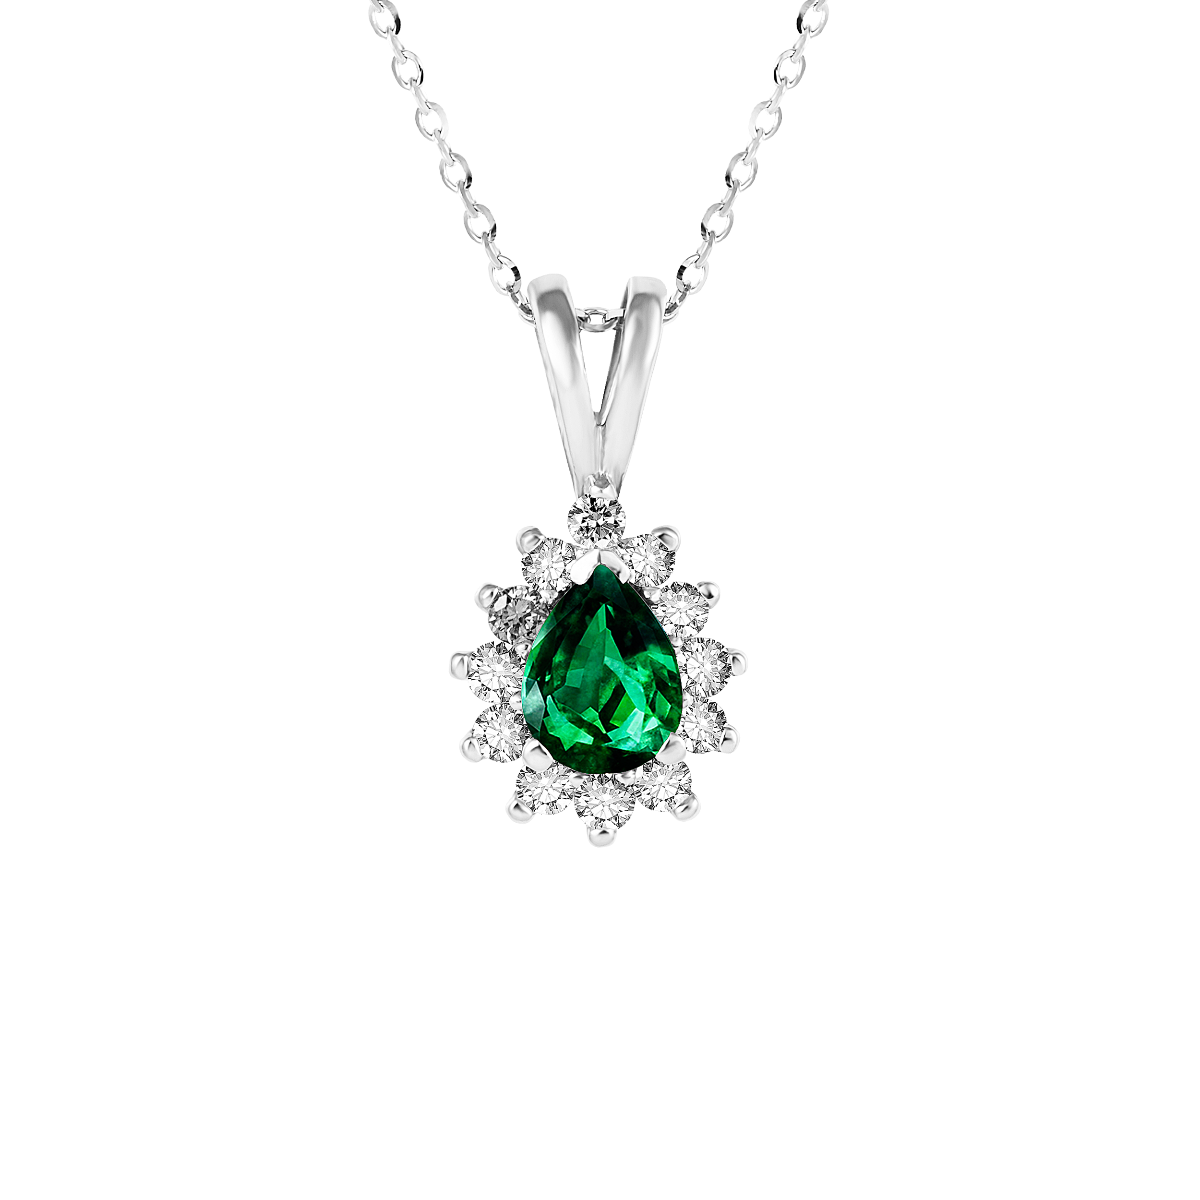 Pendente de esmeralda e diamantes